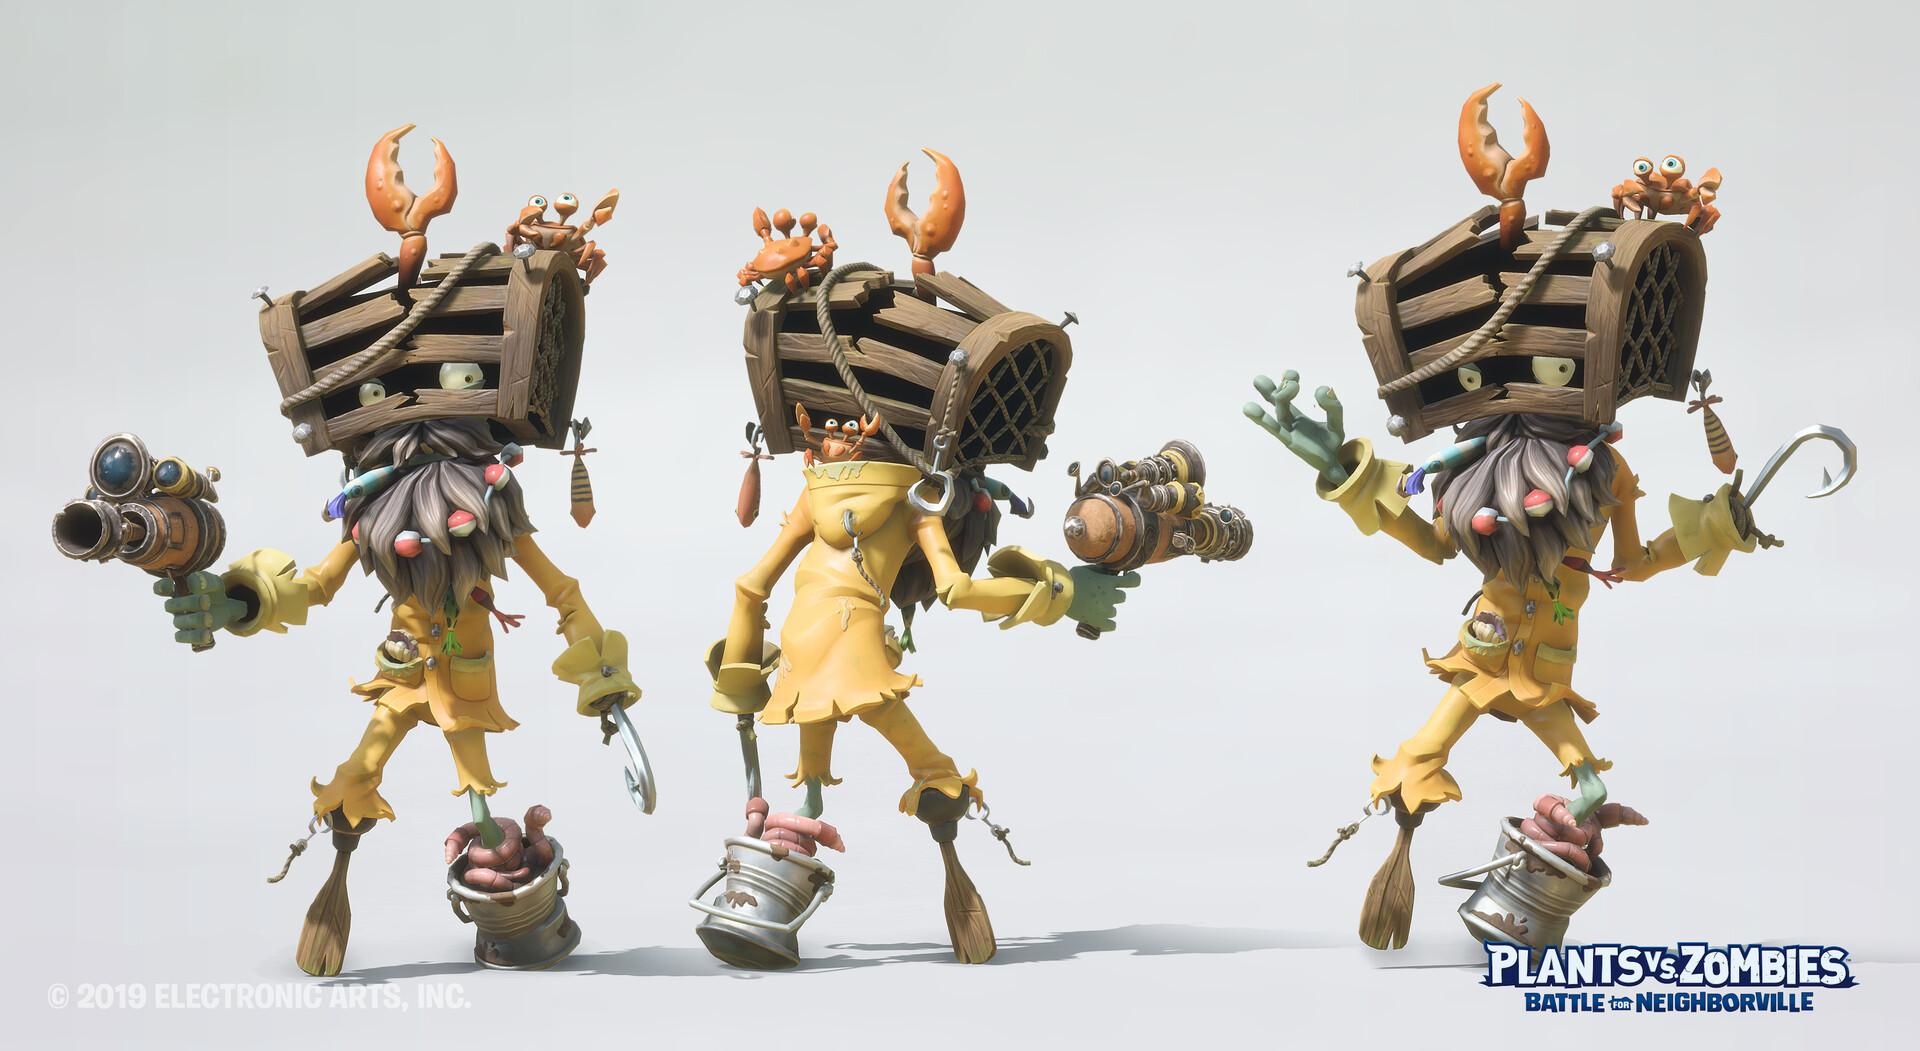 Captain Shipwreck Skin Textures: Adriana Zamora Highpoly Sculpt: Iouri Rybalka, Oscar Loris, Mirim Lee, Meggie Wang